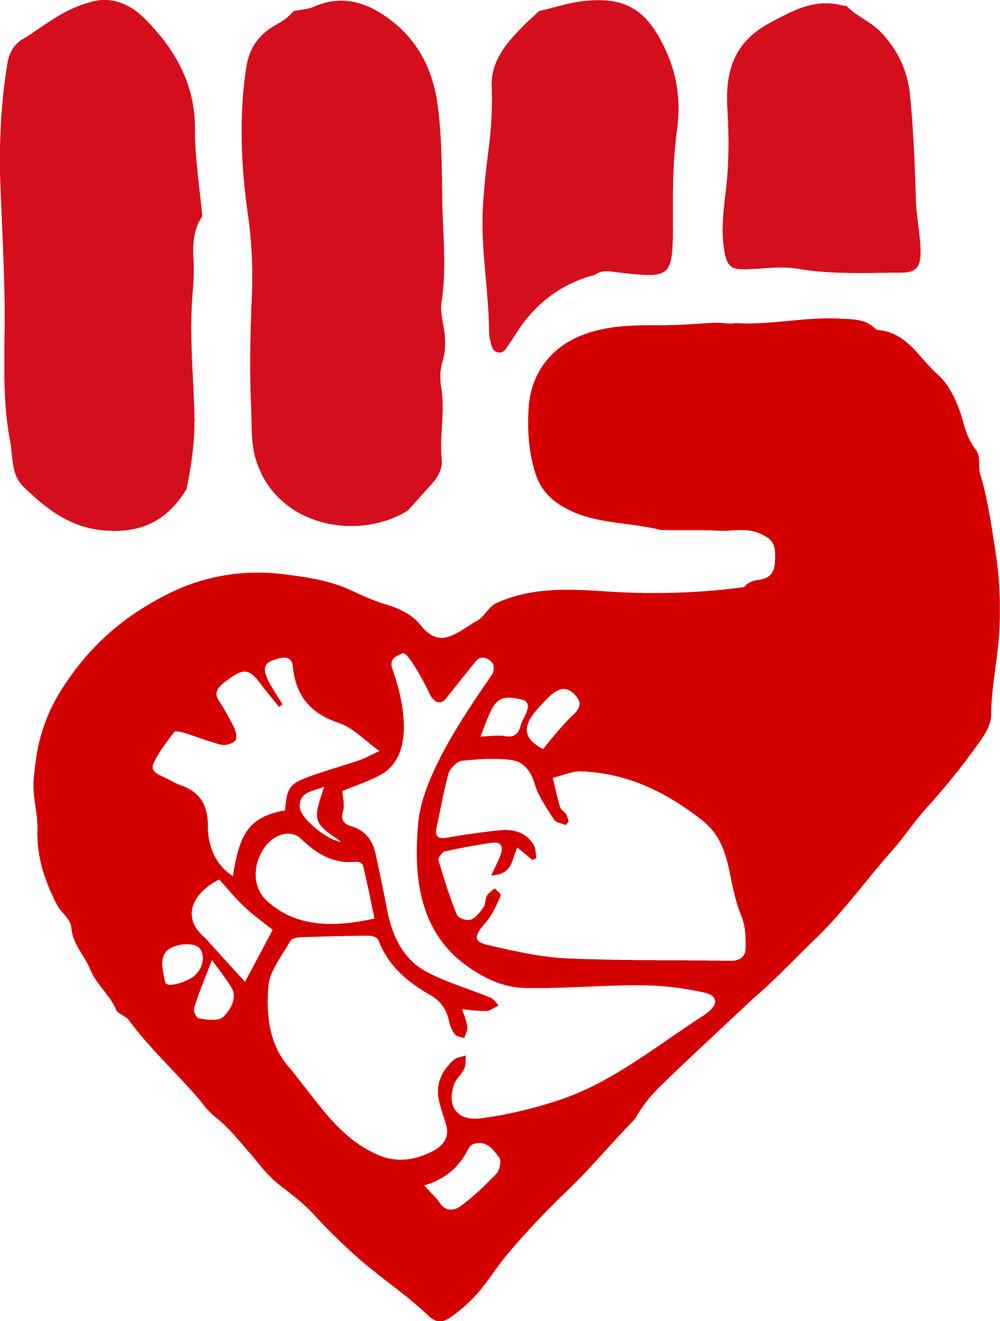 kyle - heart_fist2.jpg